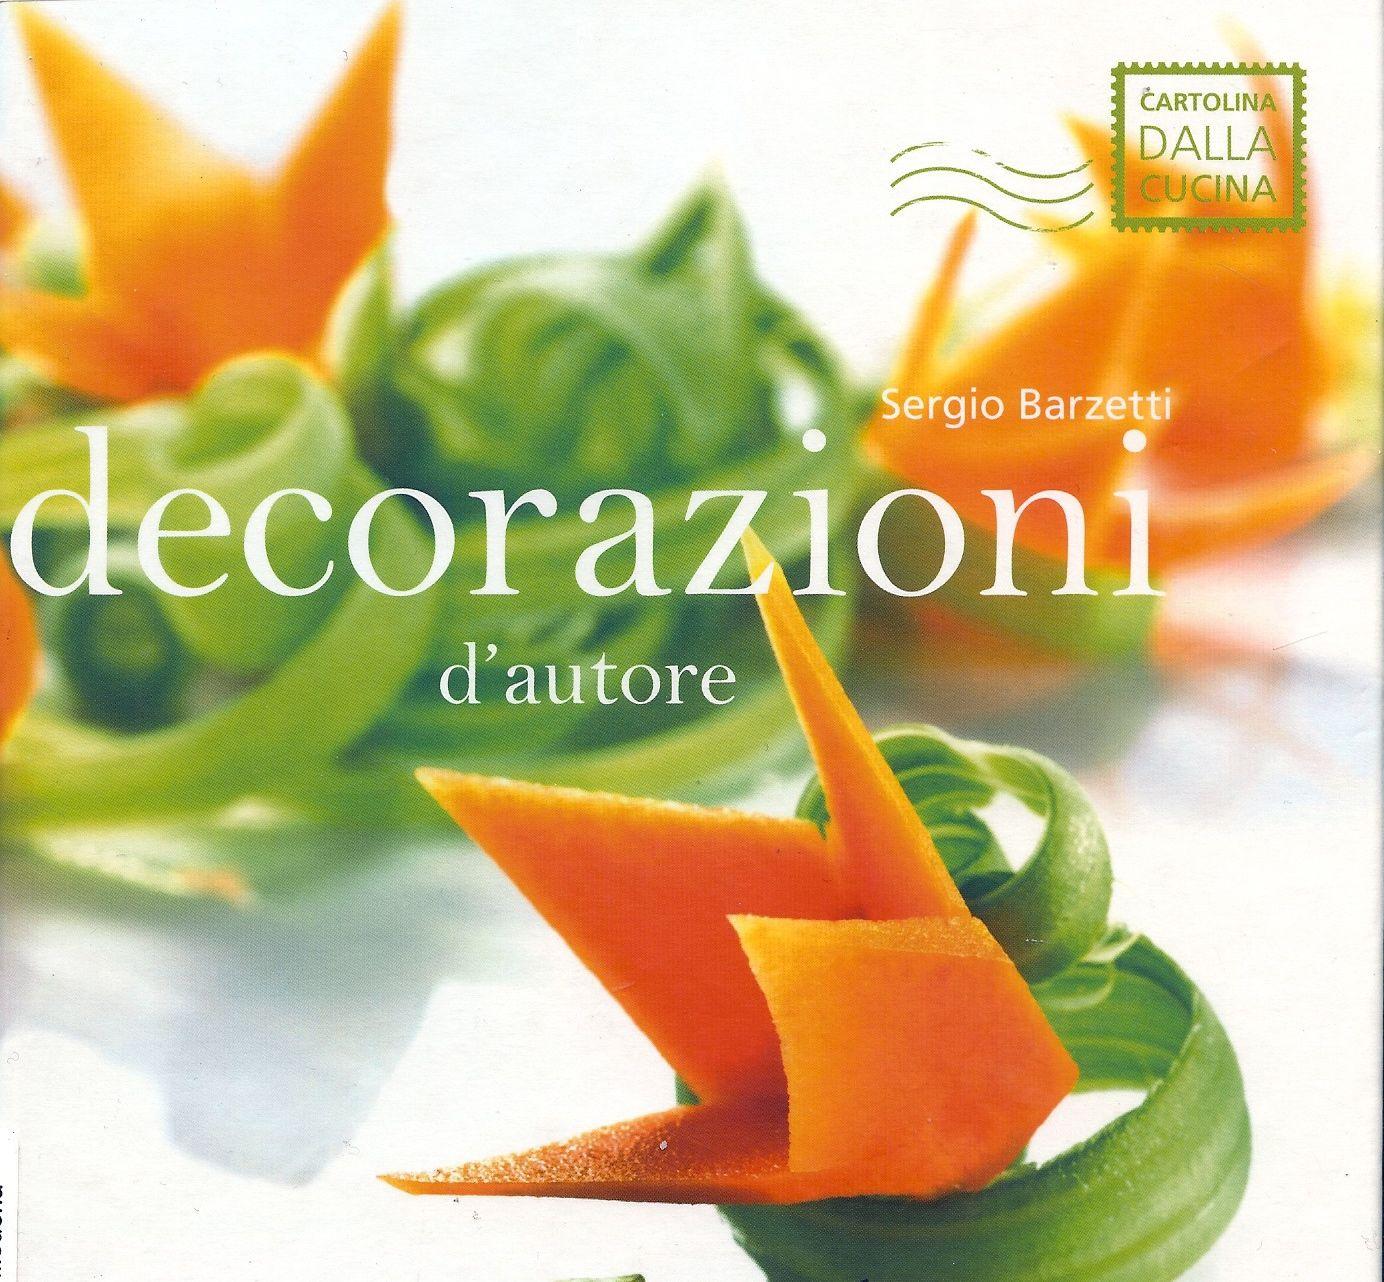 Decorazioni per piatti in cucina great banner compleanno for Decorazioni in cucina